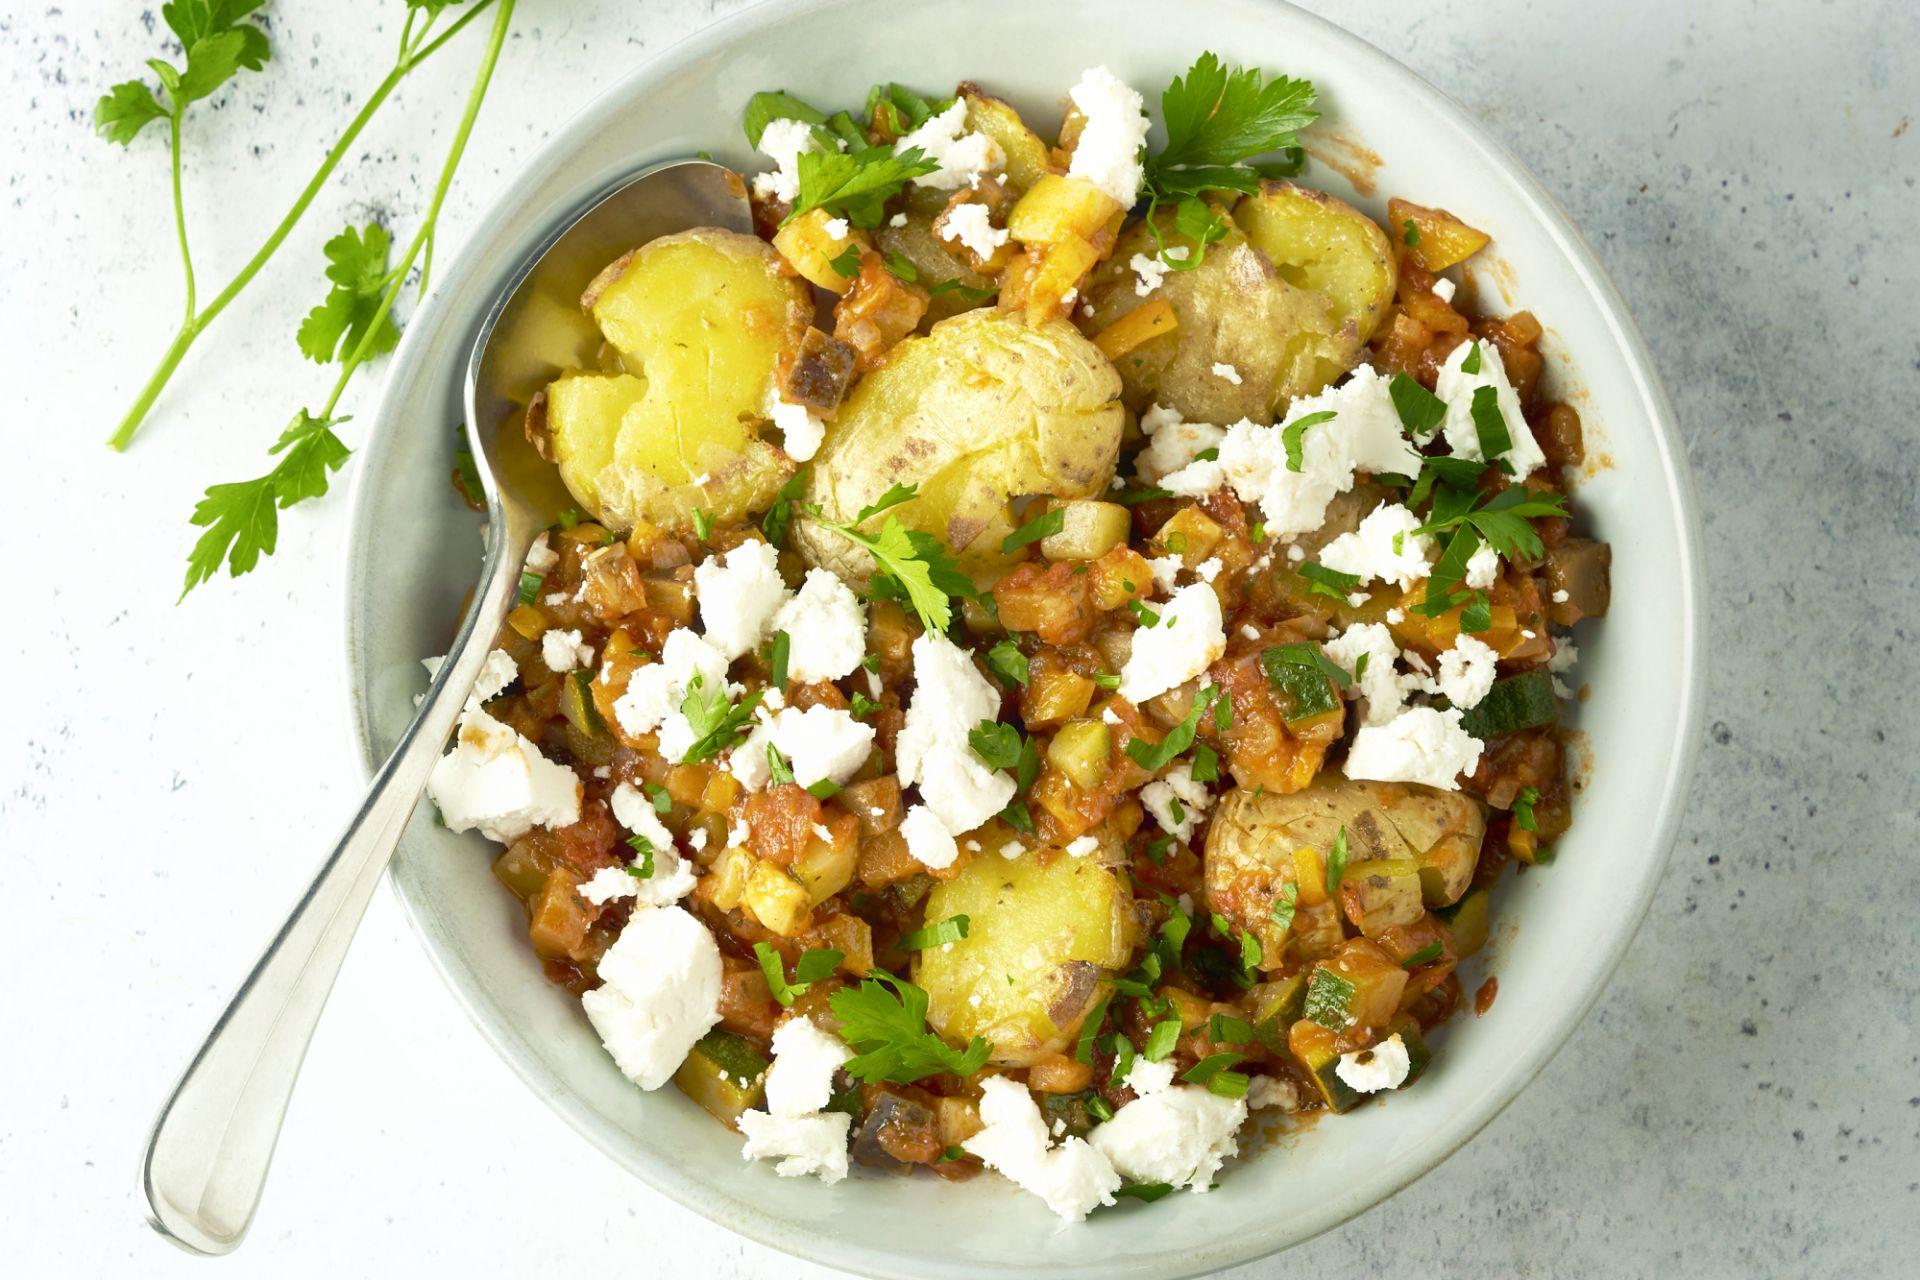 Geplette aardappelen met ratatouille en geitenkaas